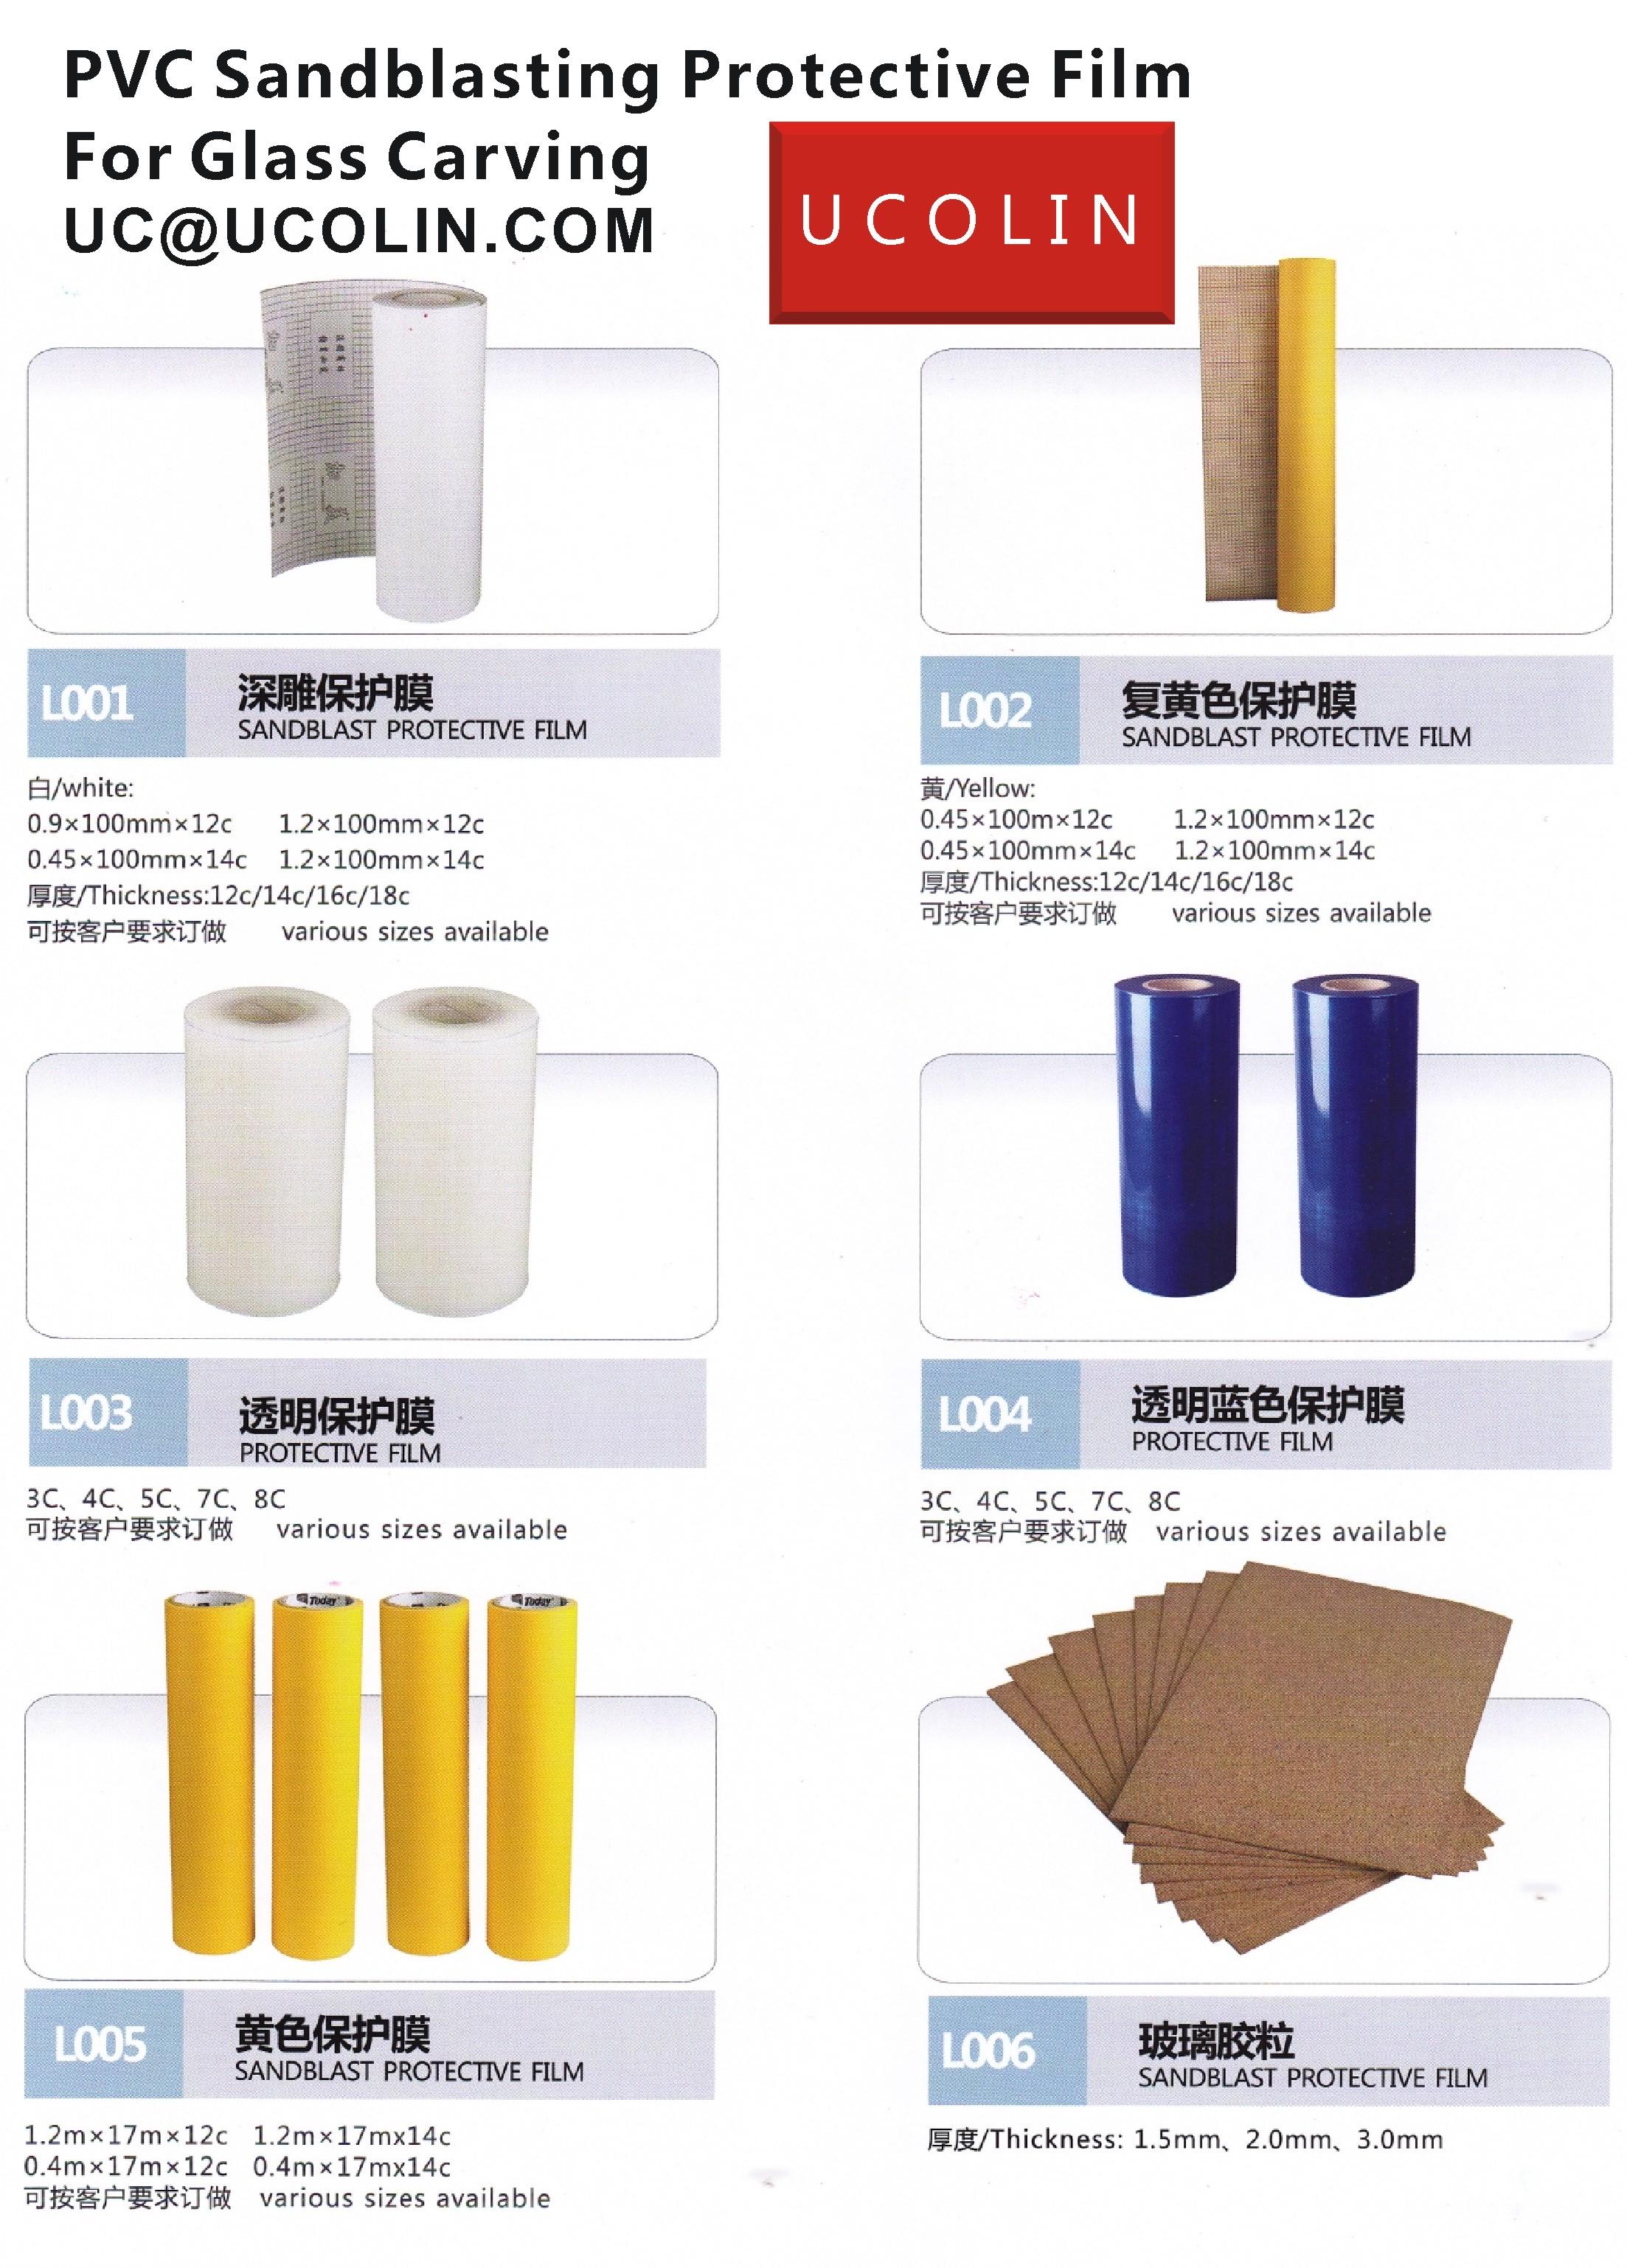 PVC Sandblasting Protective Film For Glass Carving